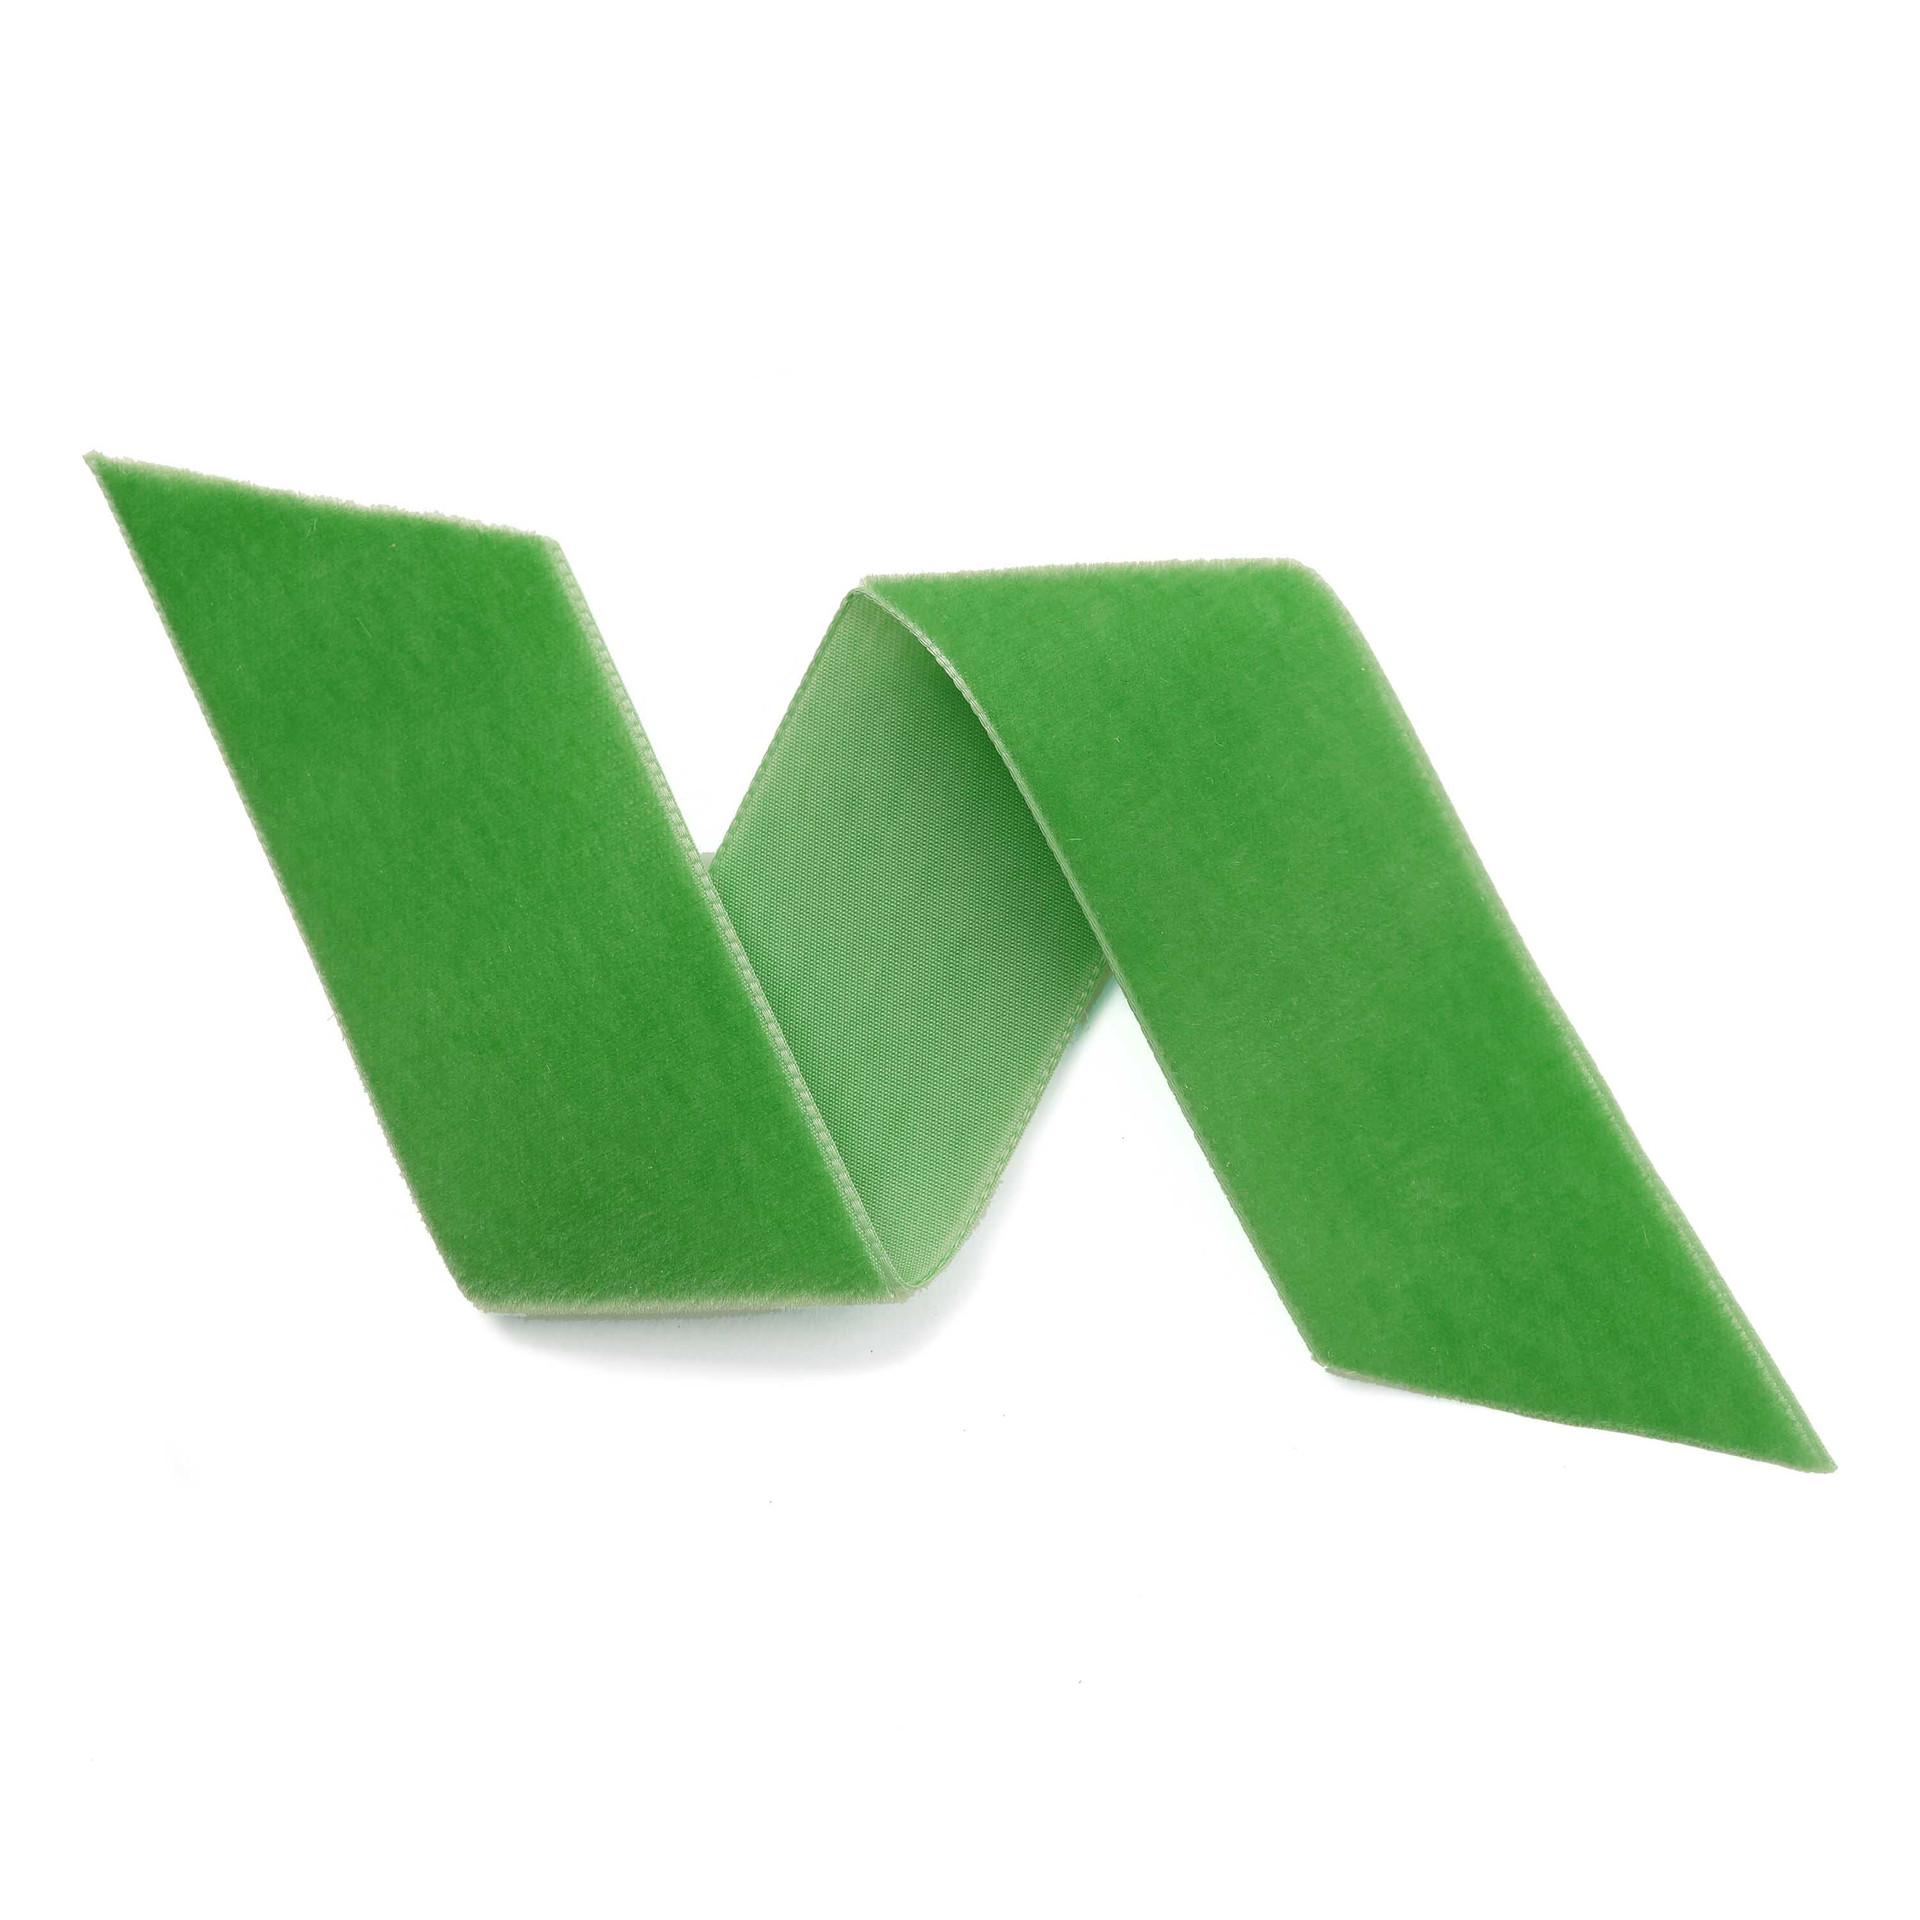 Jade Green Velvet Ribbon By The Yard